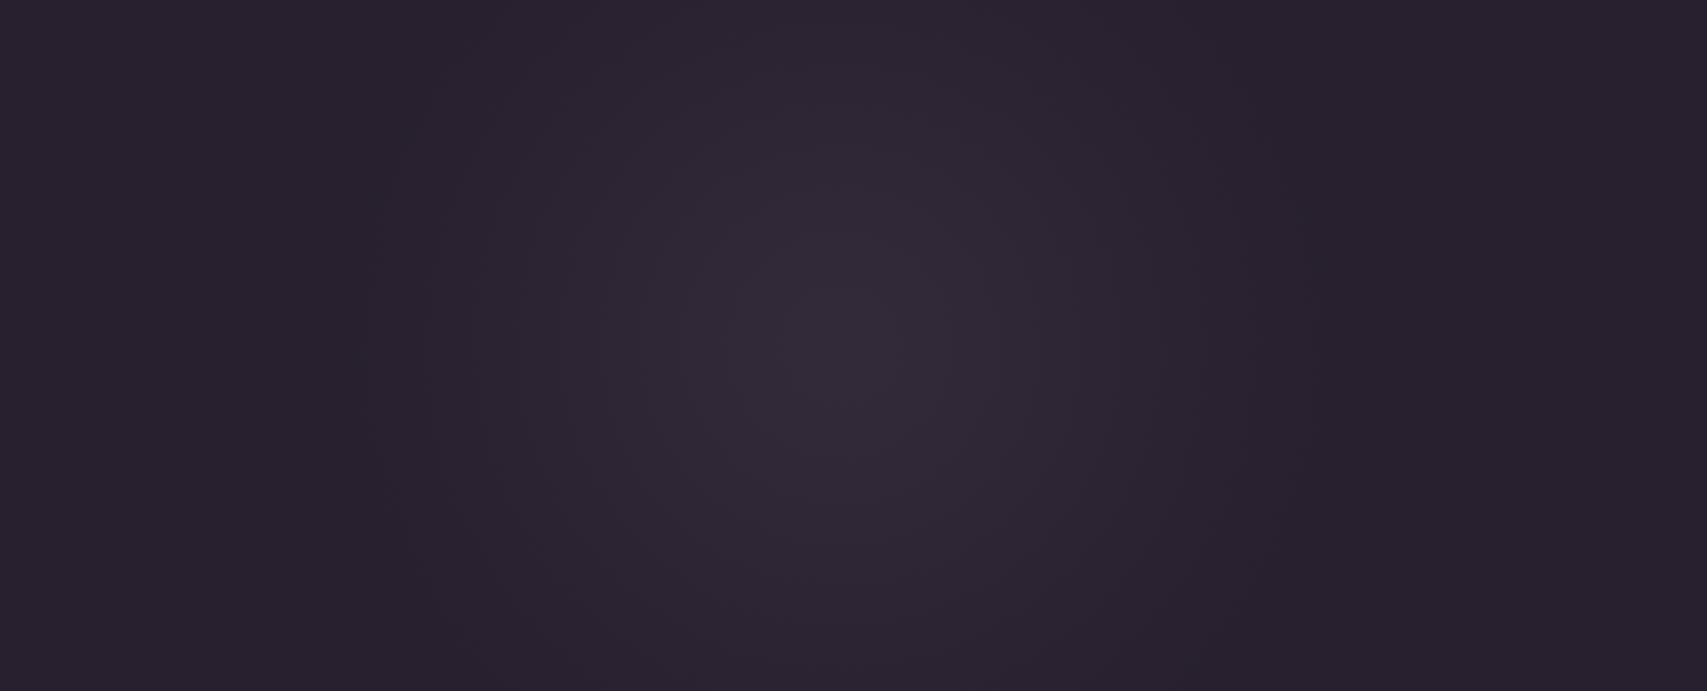 darkblurbg